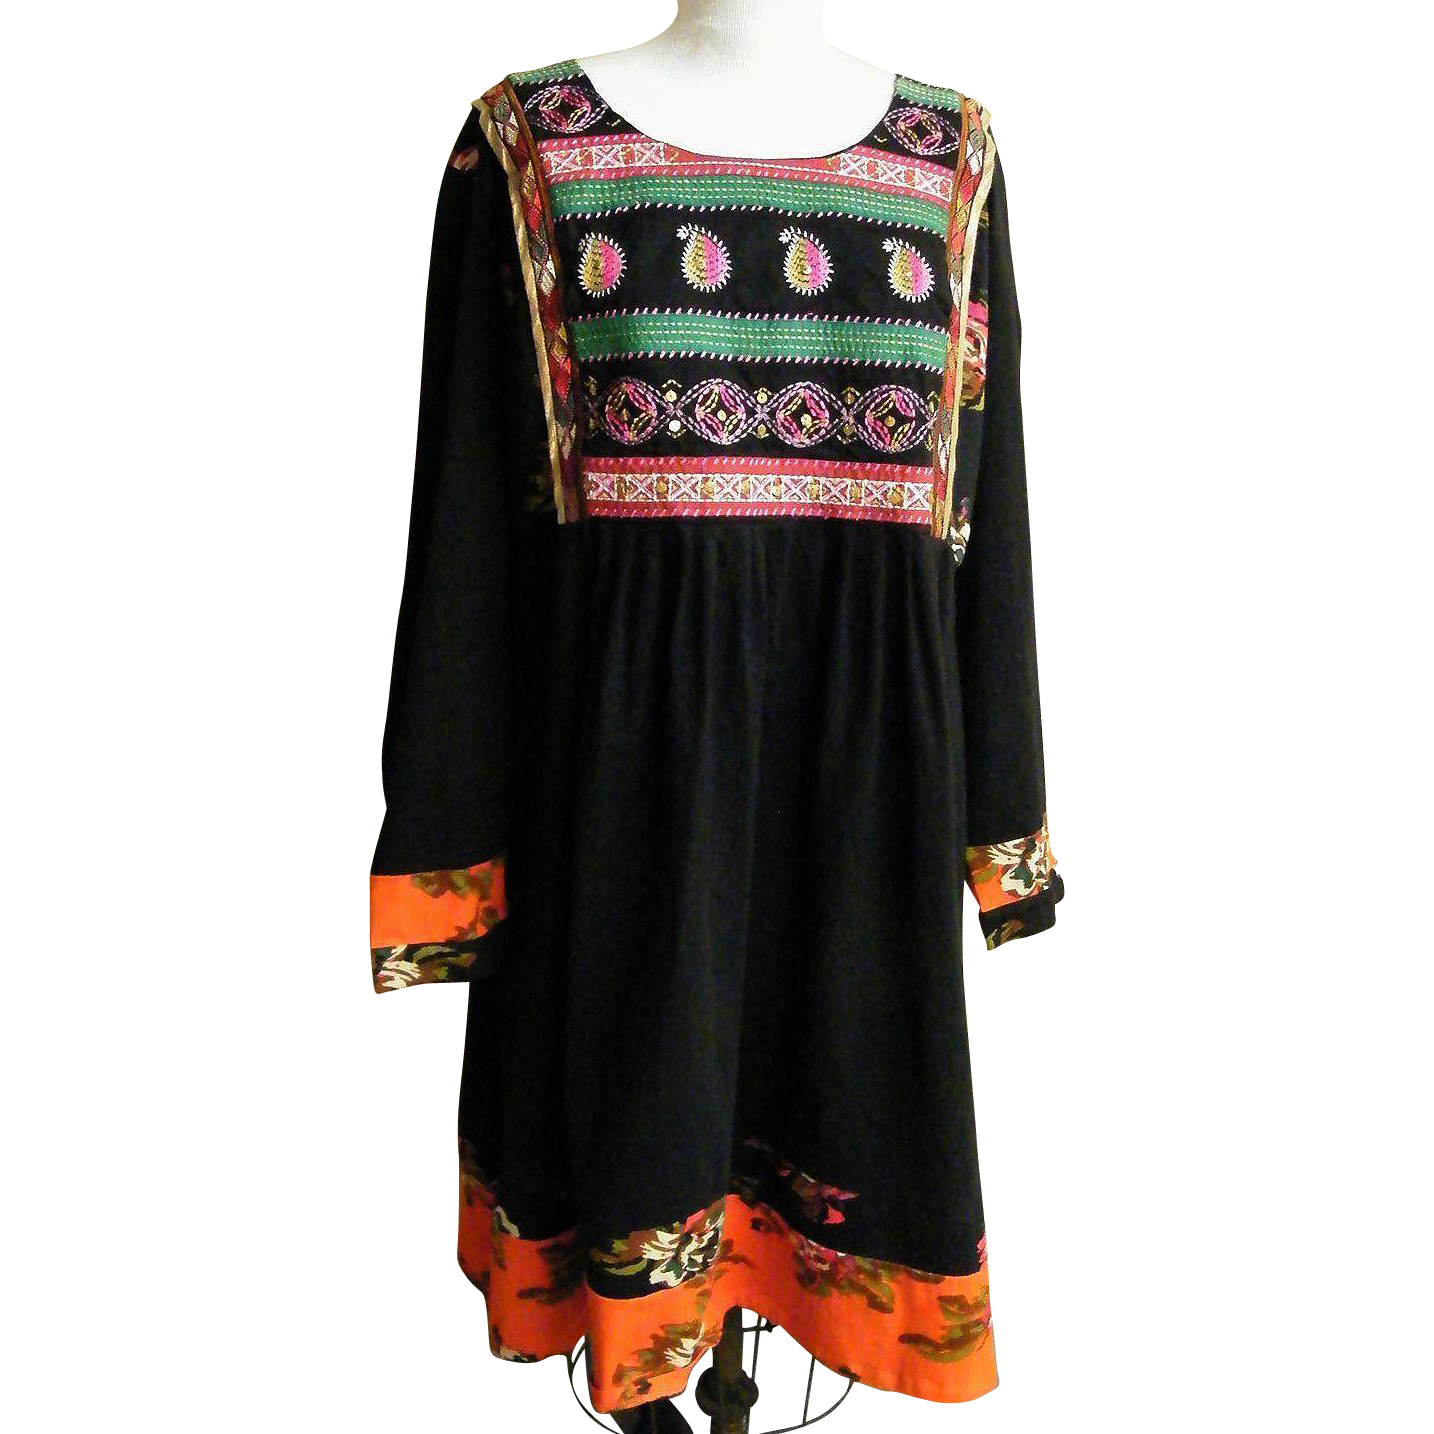 Ethnic peasant dress black cotton embroidered bib rose print inserts